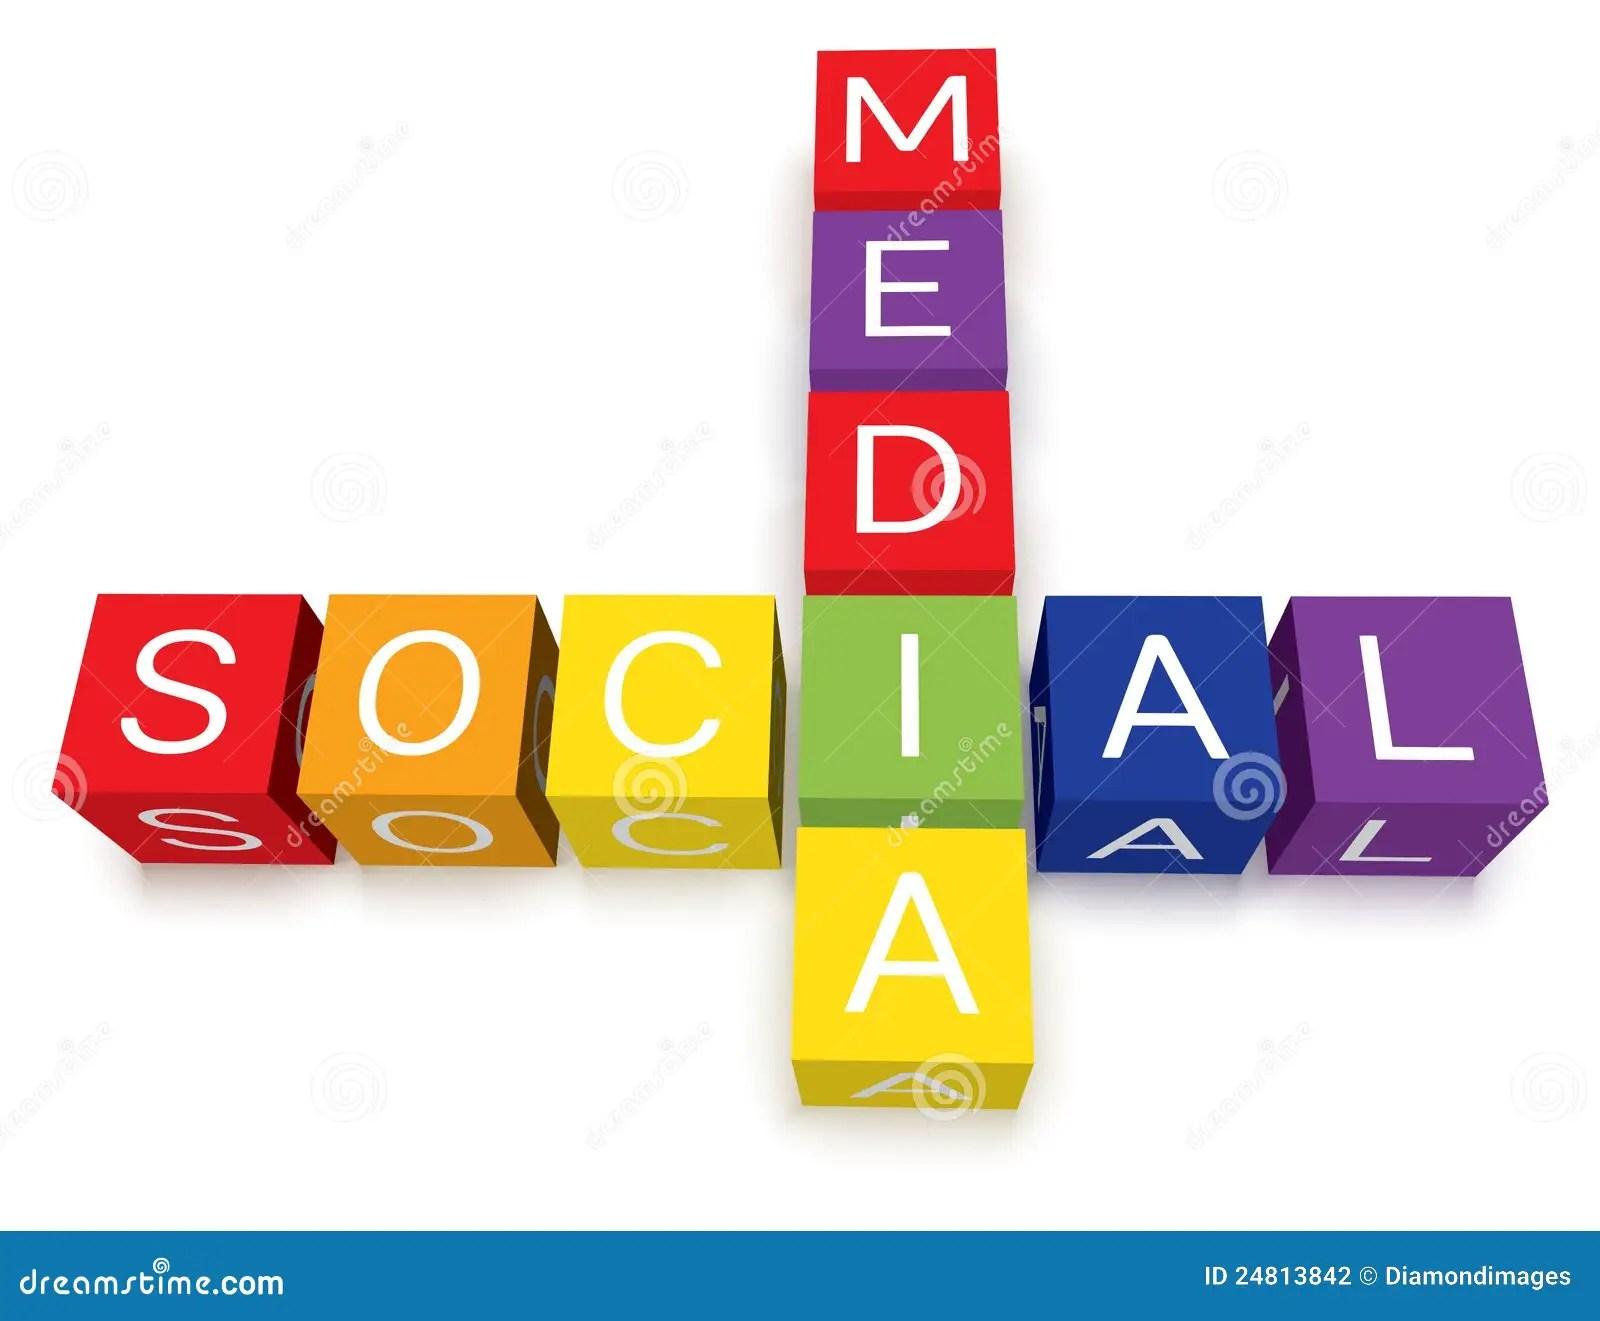 Social Media Crossword Puzzle Blocks Stock Vector